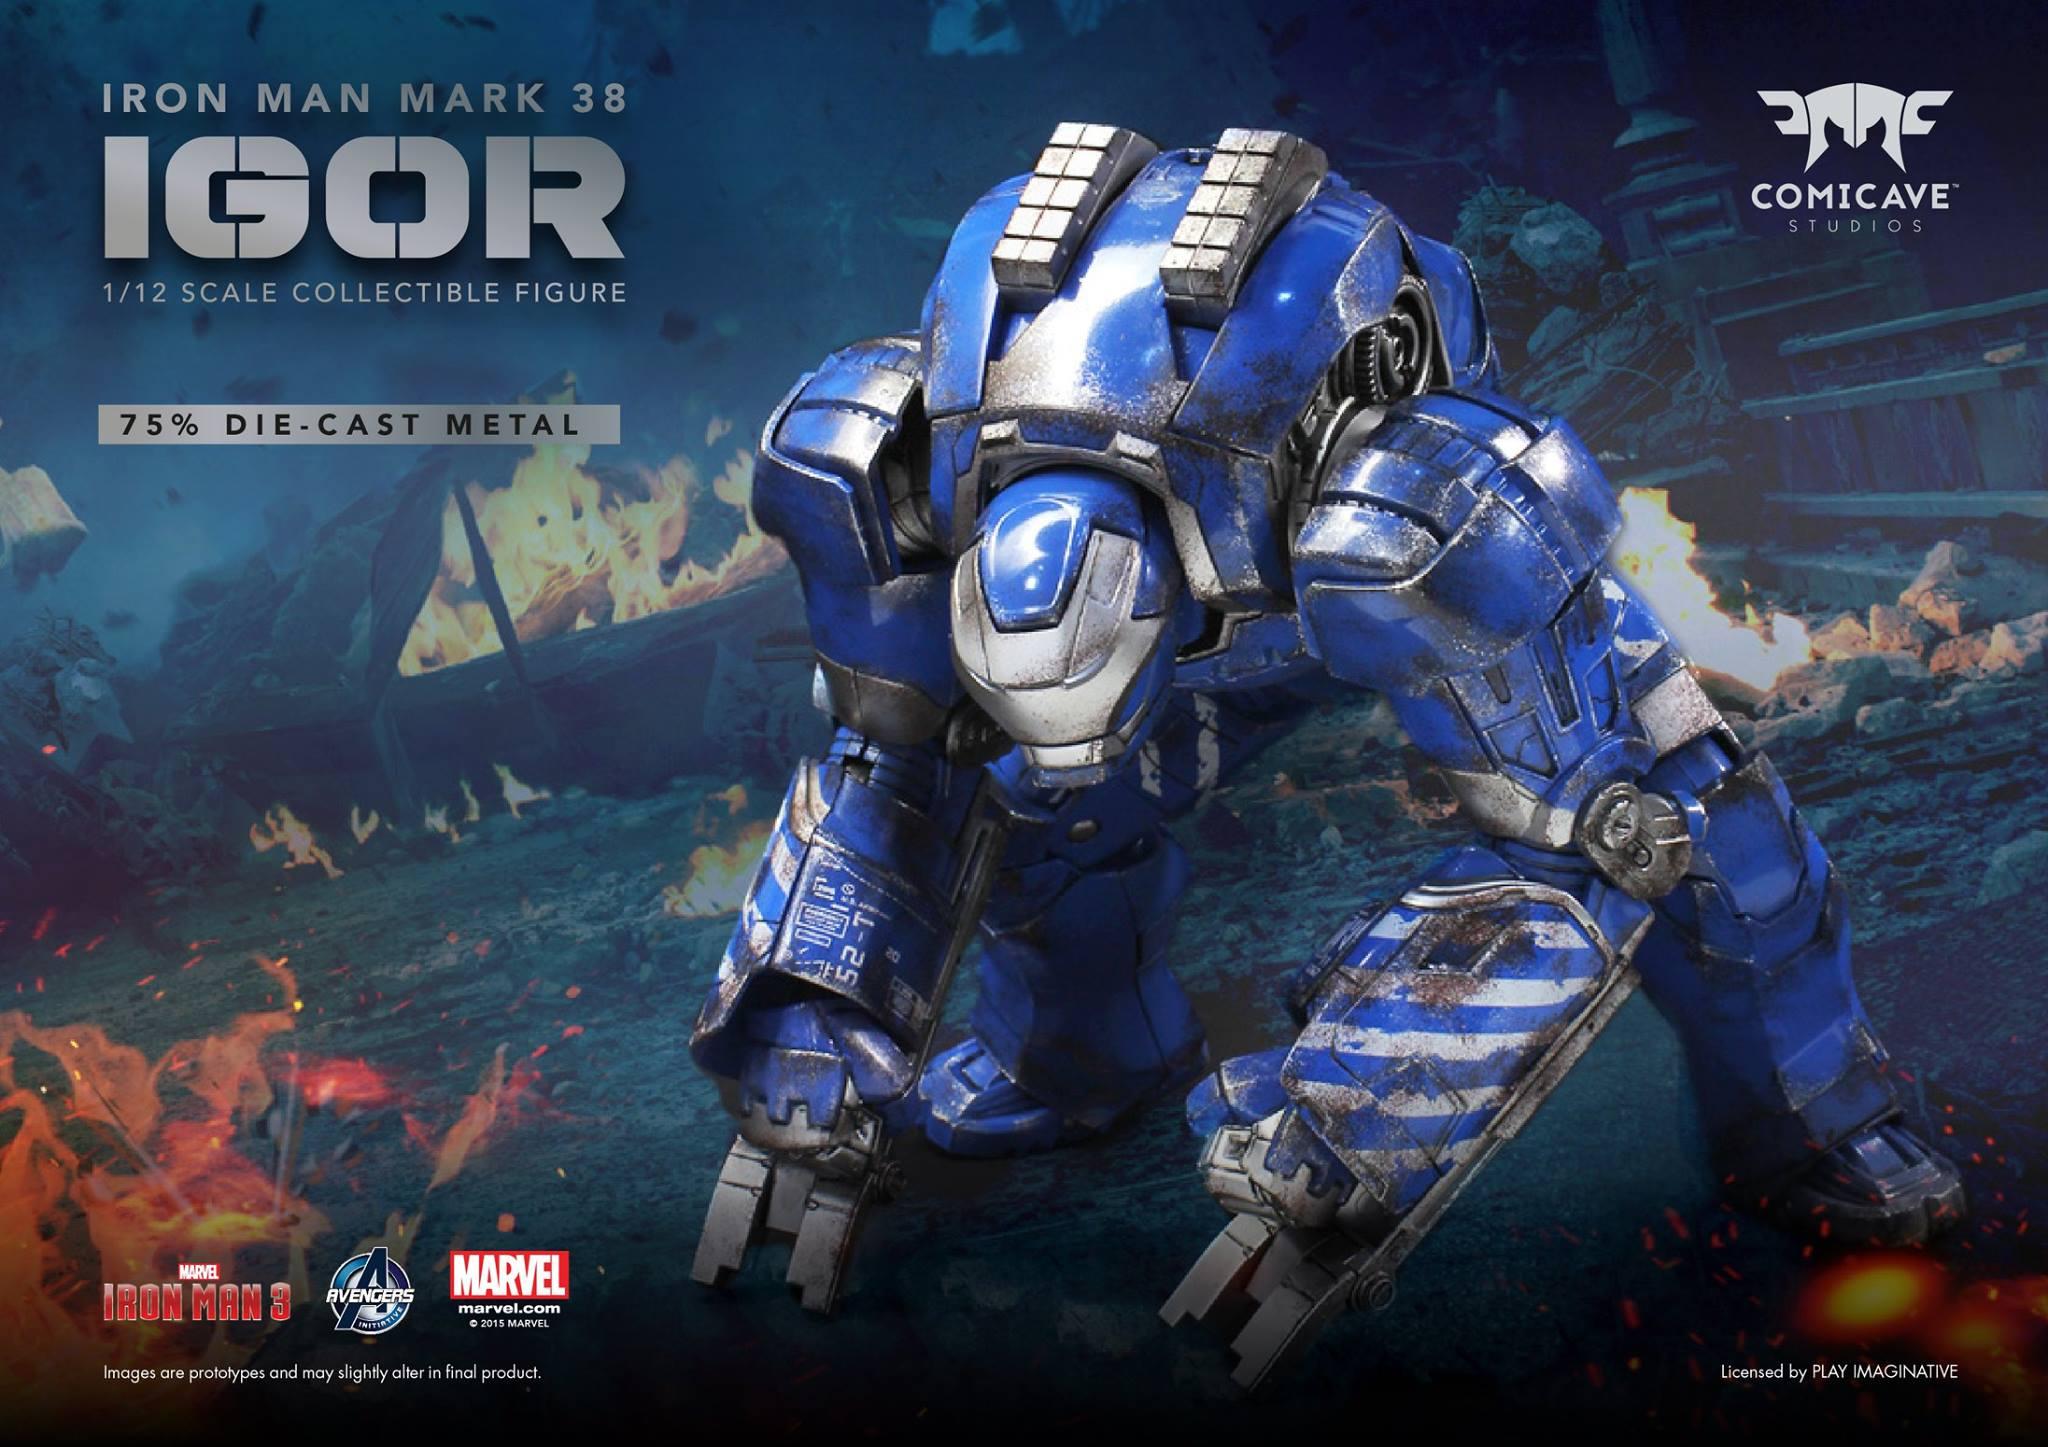 comicave-studios-iron-man-3-mark-38-igor-1-12th-scale-figure-02